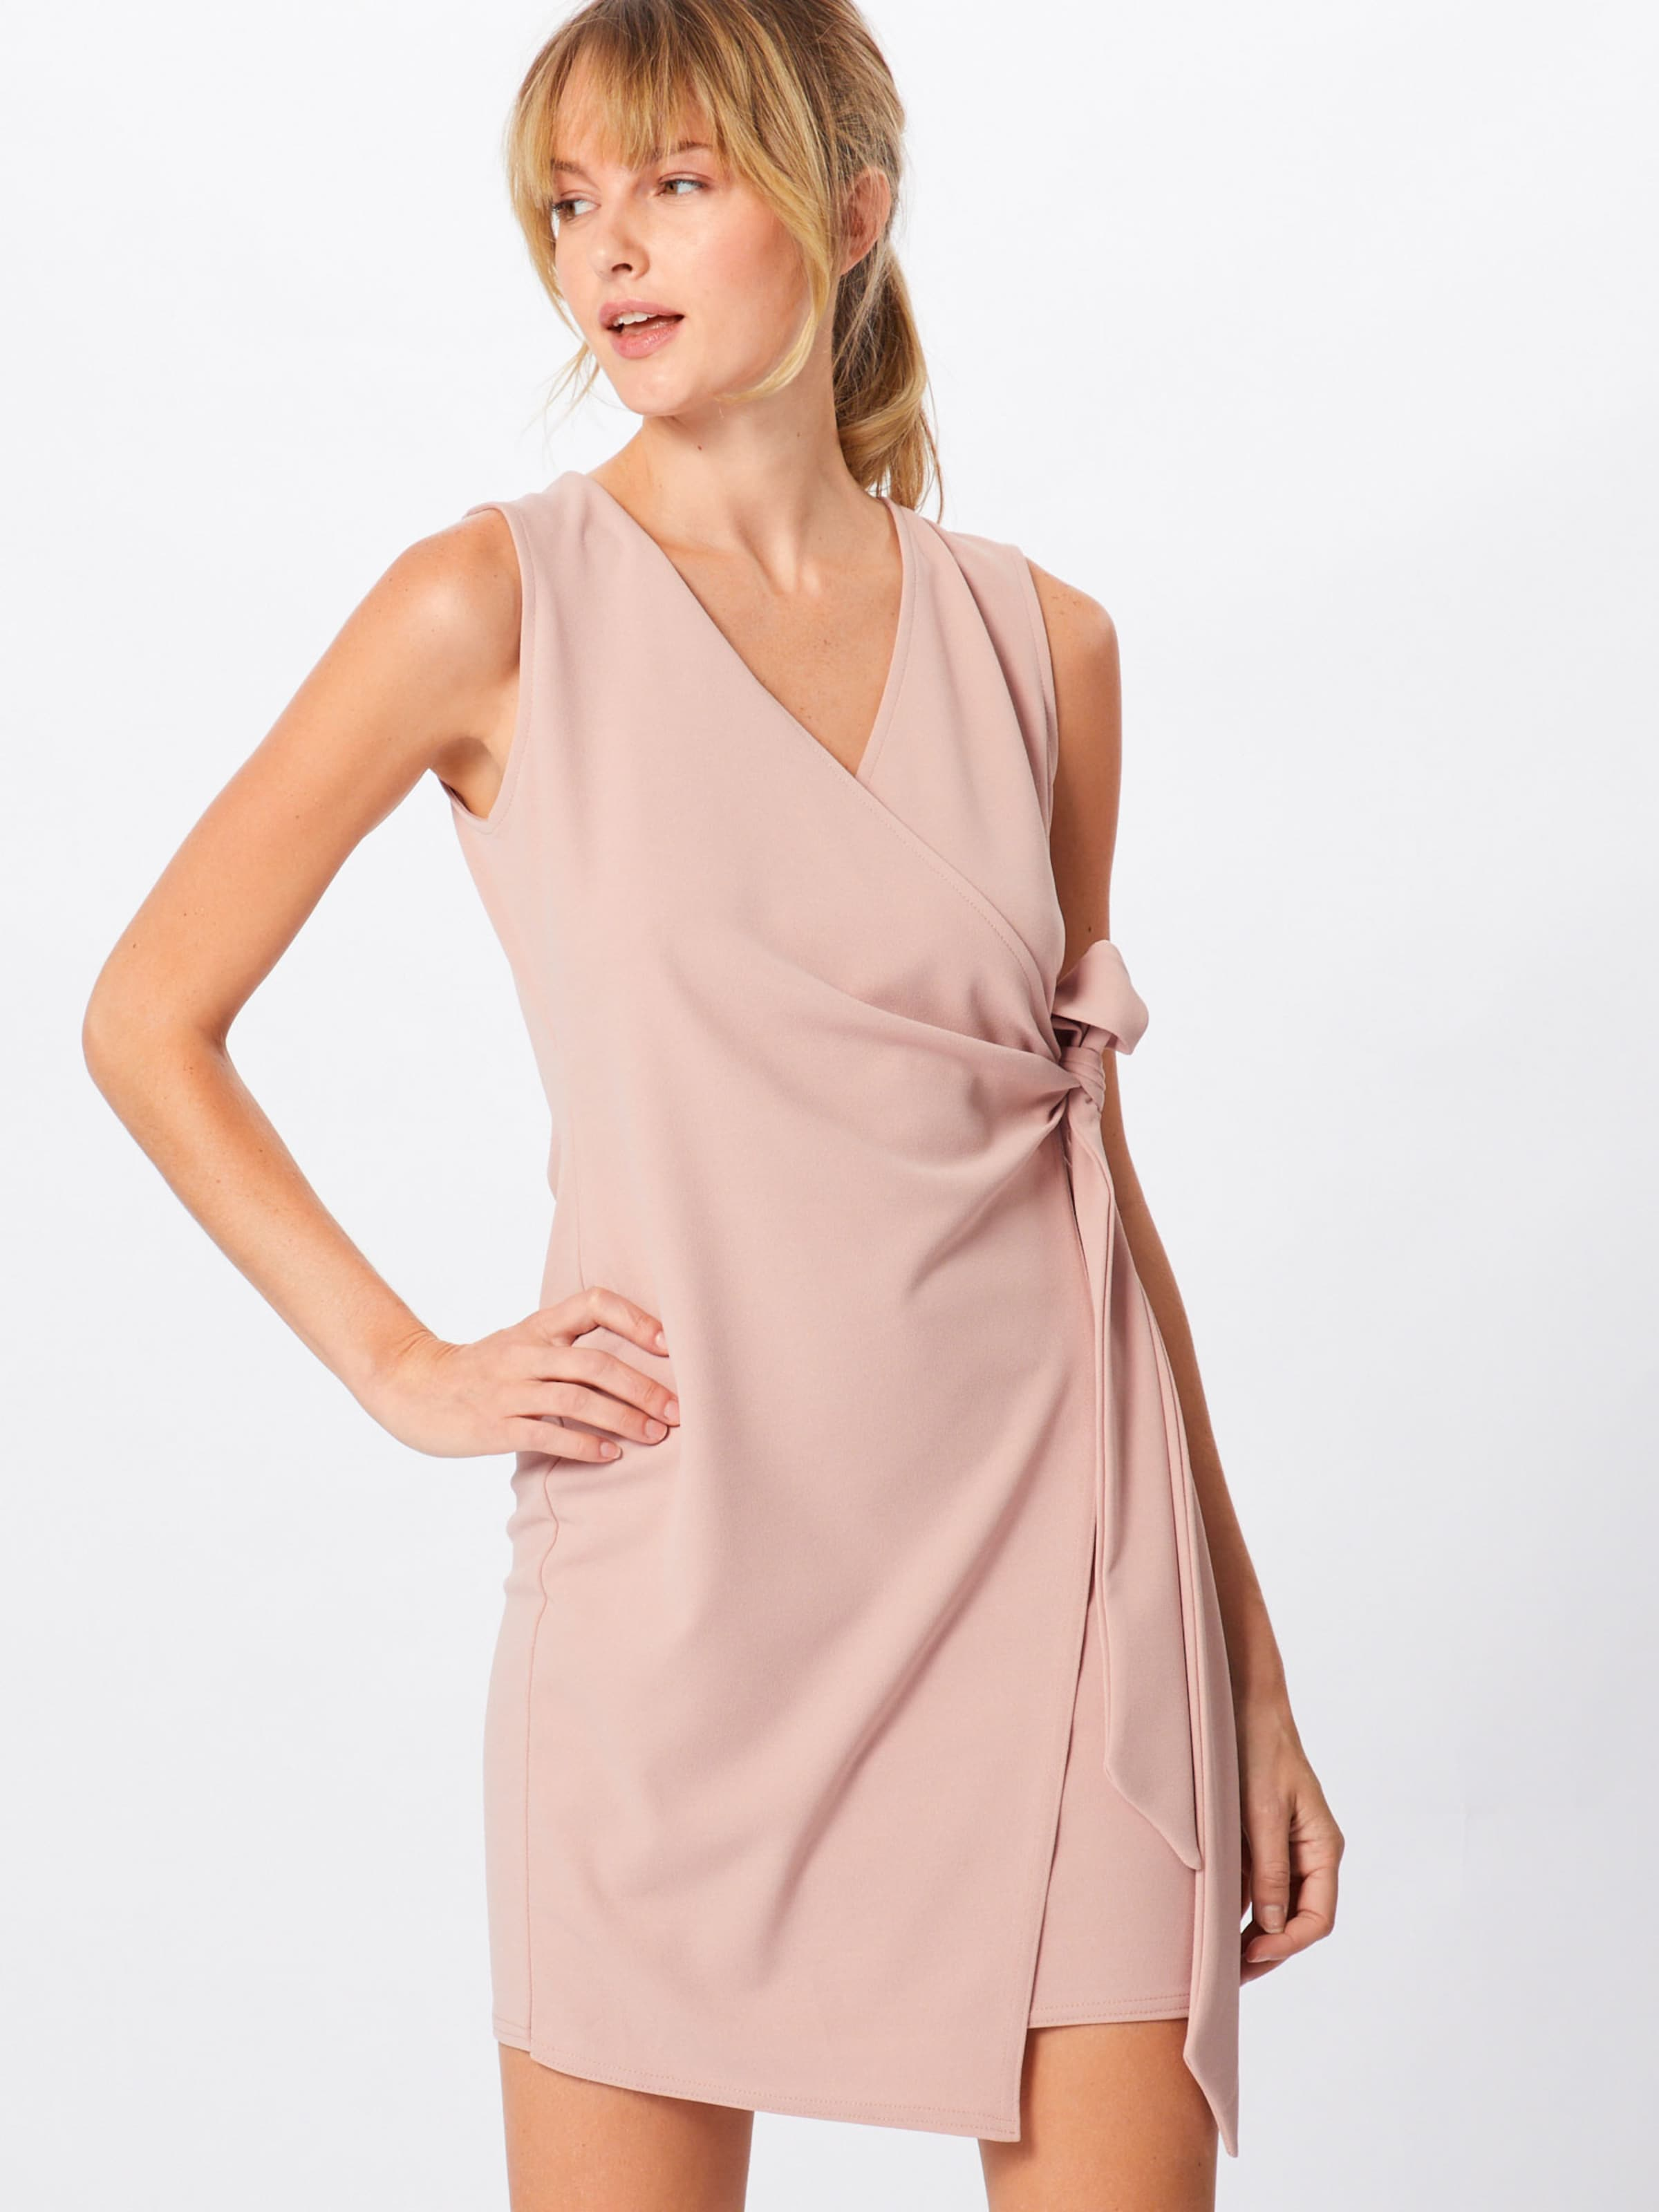 Boohoo Rosa In Kleid In Boohoo Rosa Kleid ZuTkPOiX